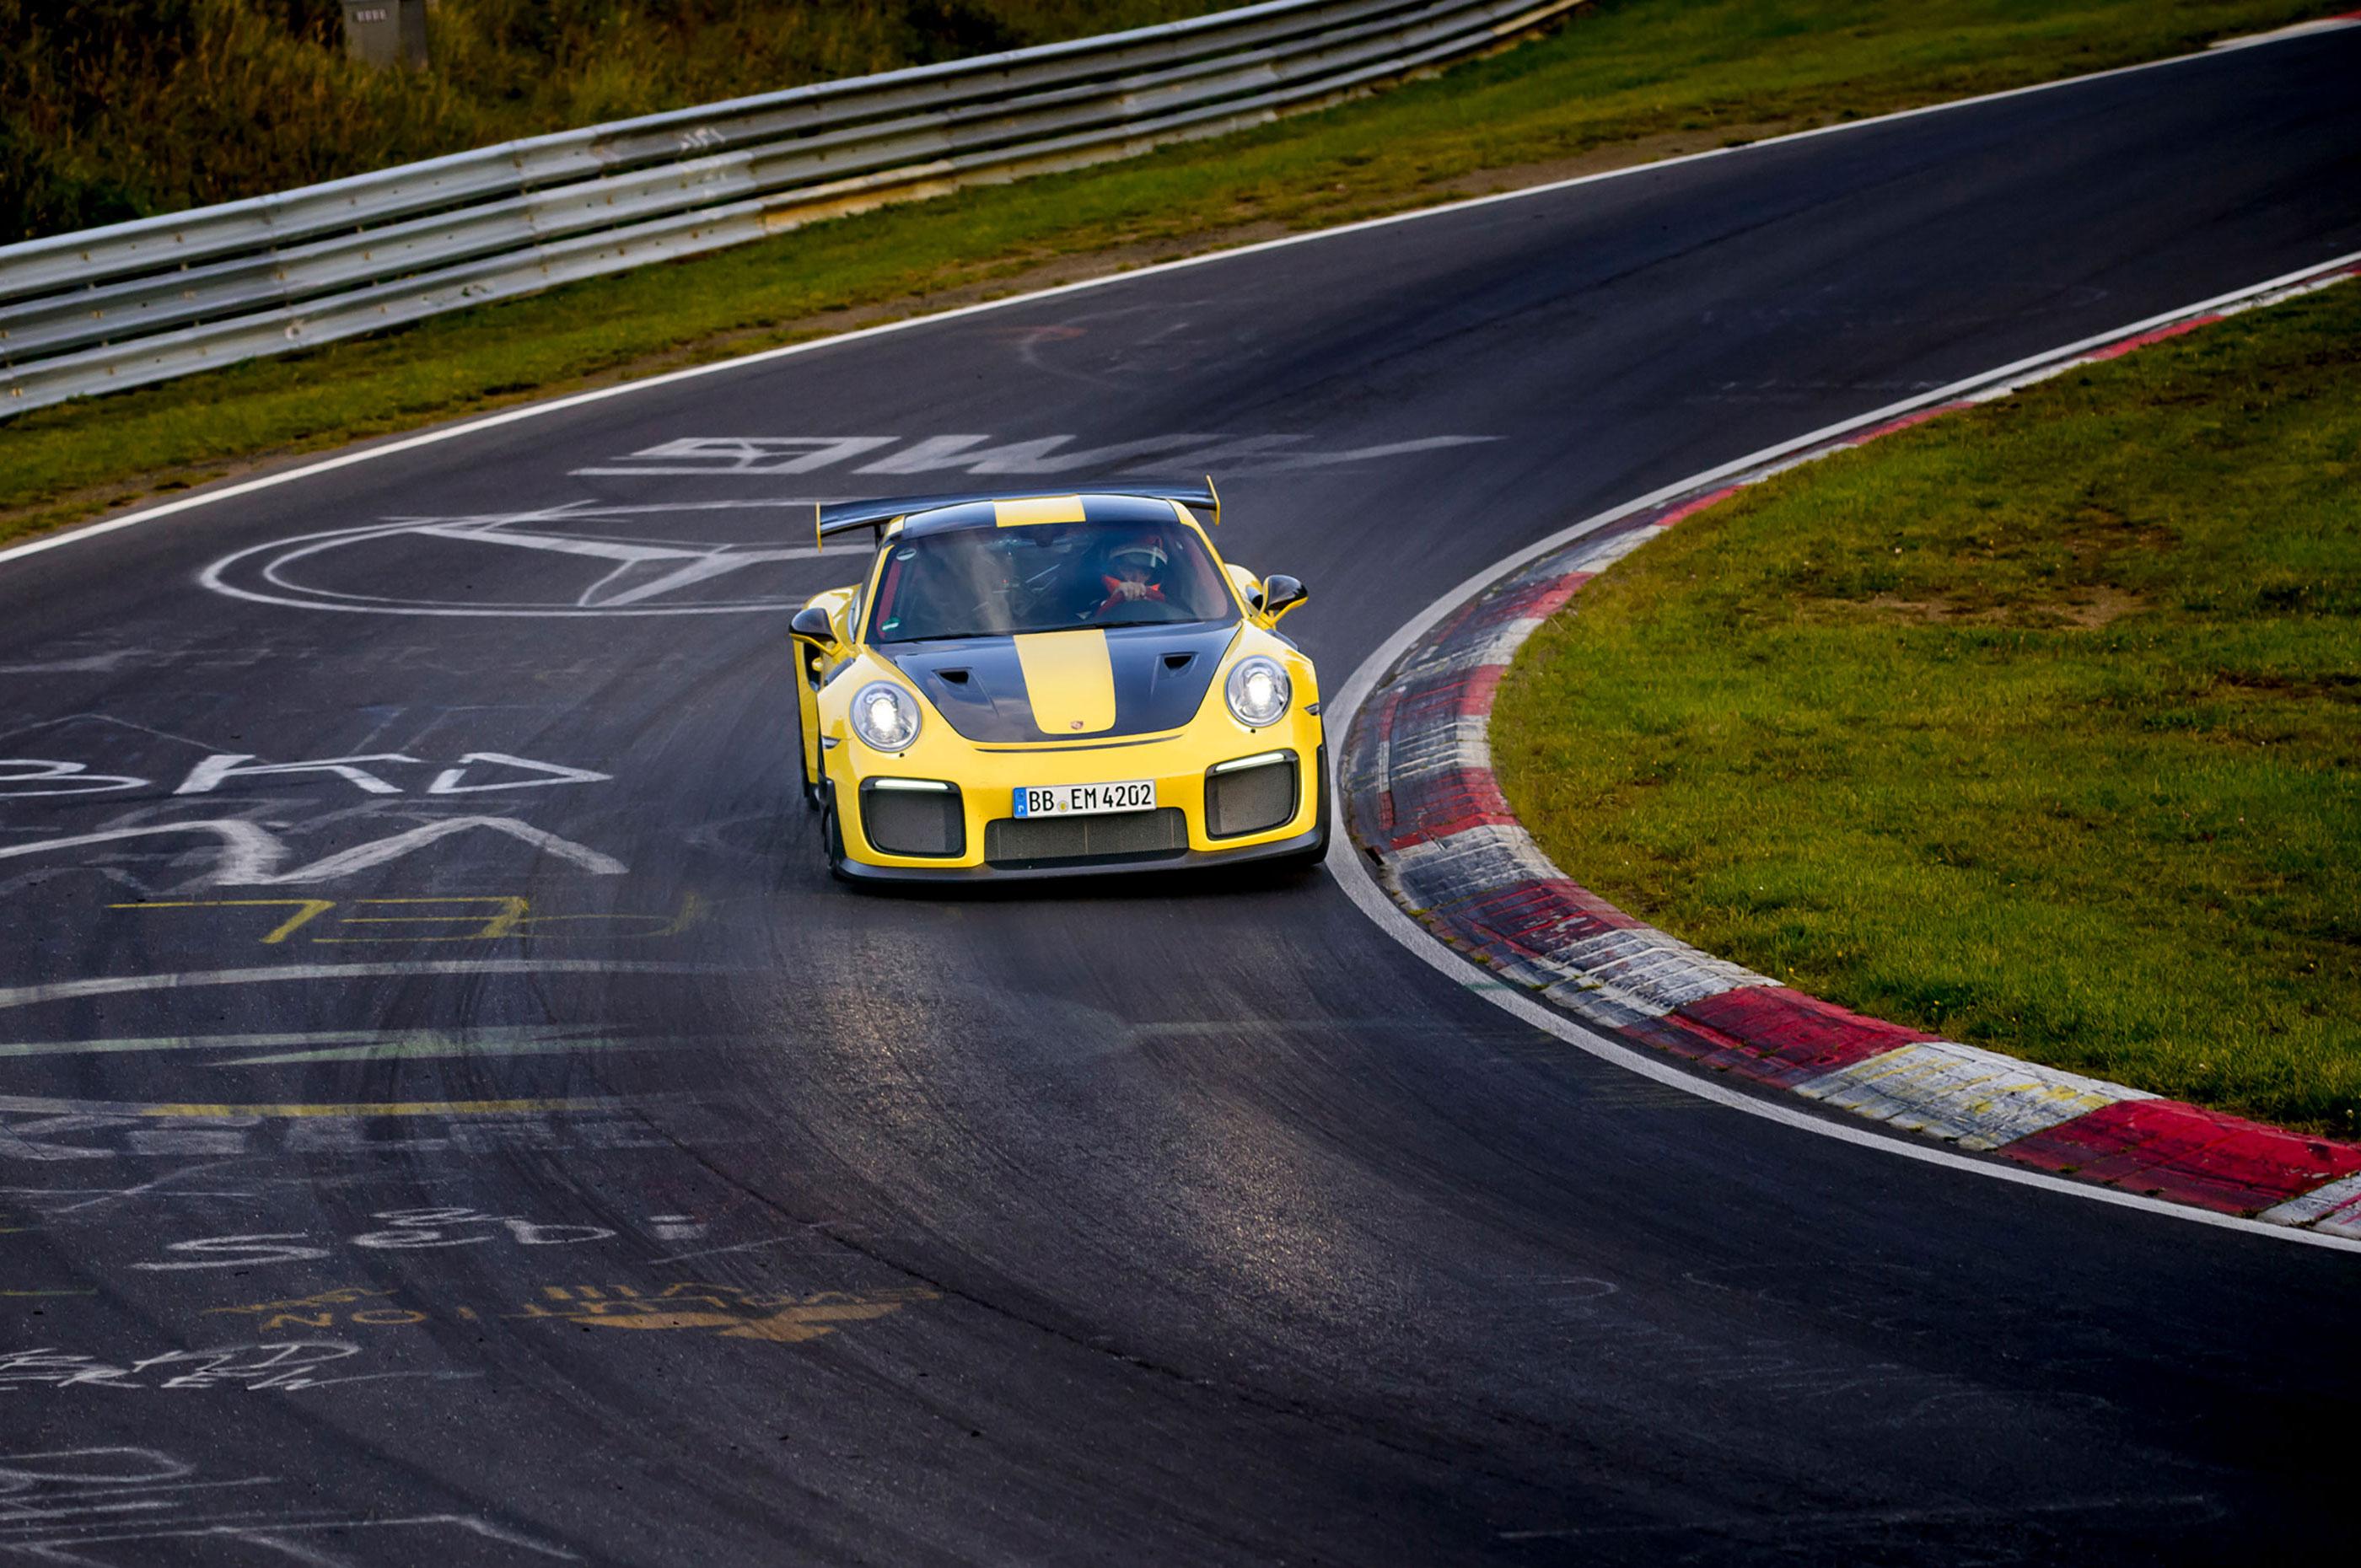 2018-Porsche-911-GT2-RS-lap-record-2 Astounding Porsche 911 Gt2 Car and Driver Cars Trend